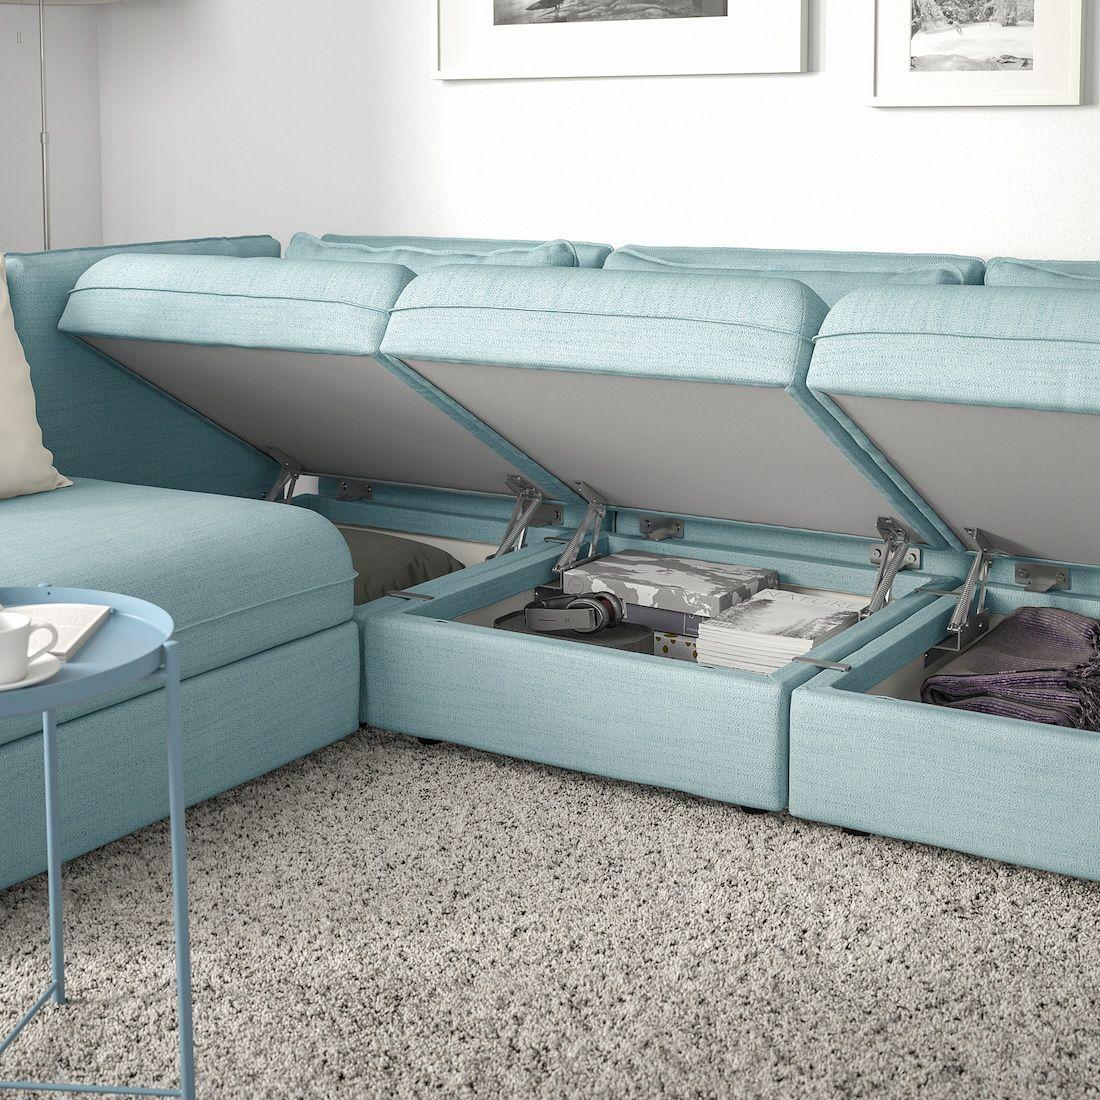 Vallentuna Modular Corner Sofa 3 Seat With Storage Hillared Light Blue Modular Corner Sofa Corner Sofa Diy Deck Furniture